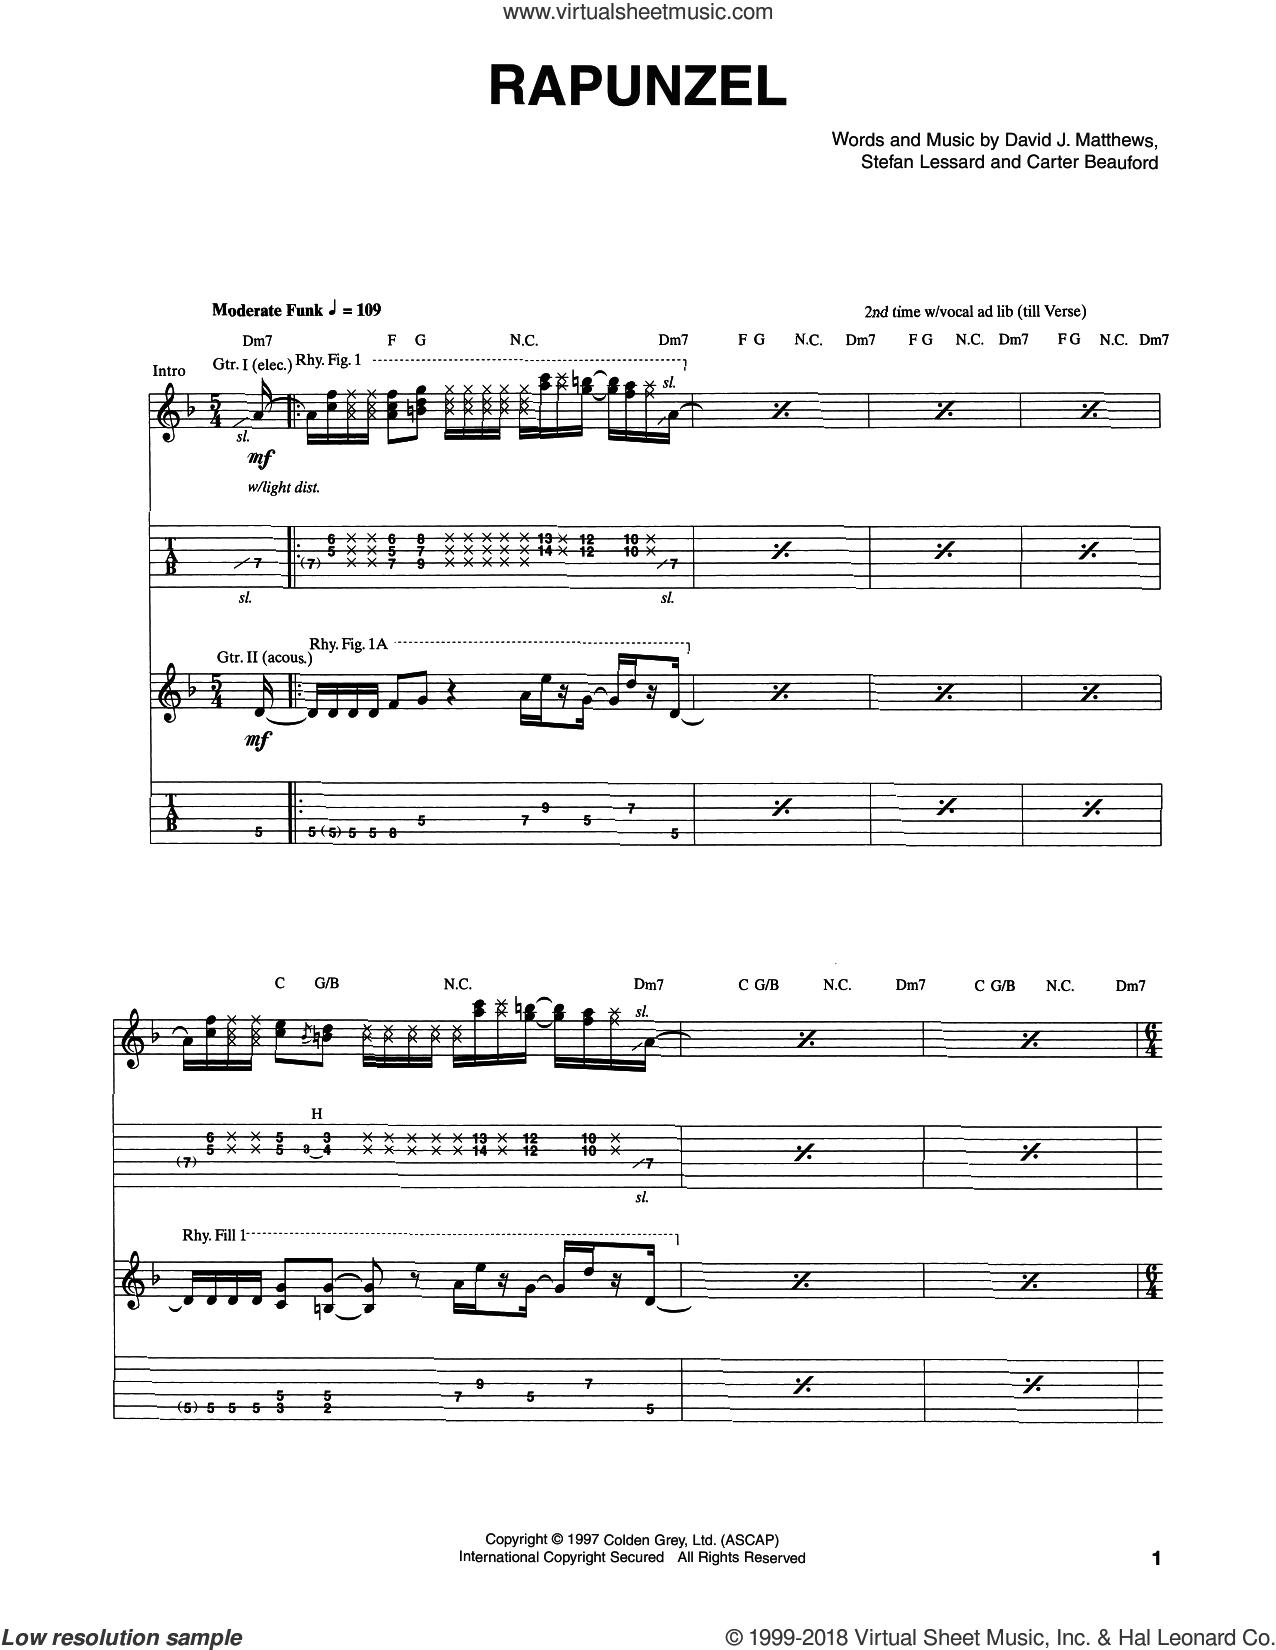 Rapunzel sheet music for guitar (tablature) by Dave Matthews Band, Carter Beauford and Stefan Lessard, intermediate skill level